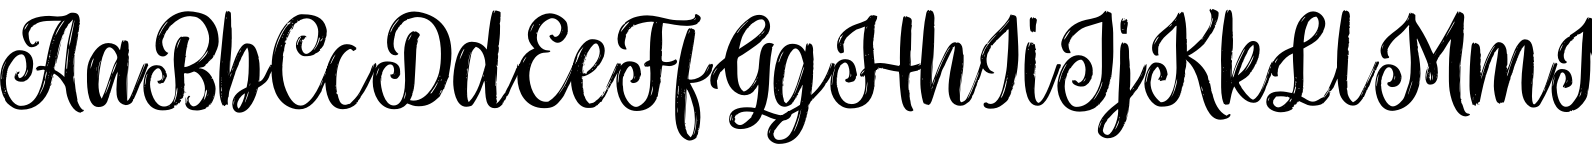 Olive - Hand Lettering Tool Kit